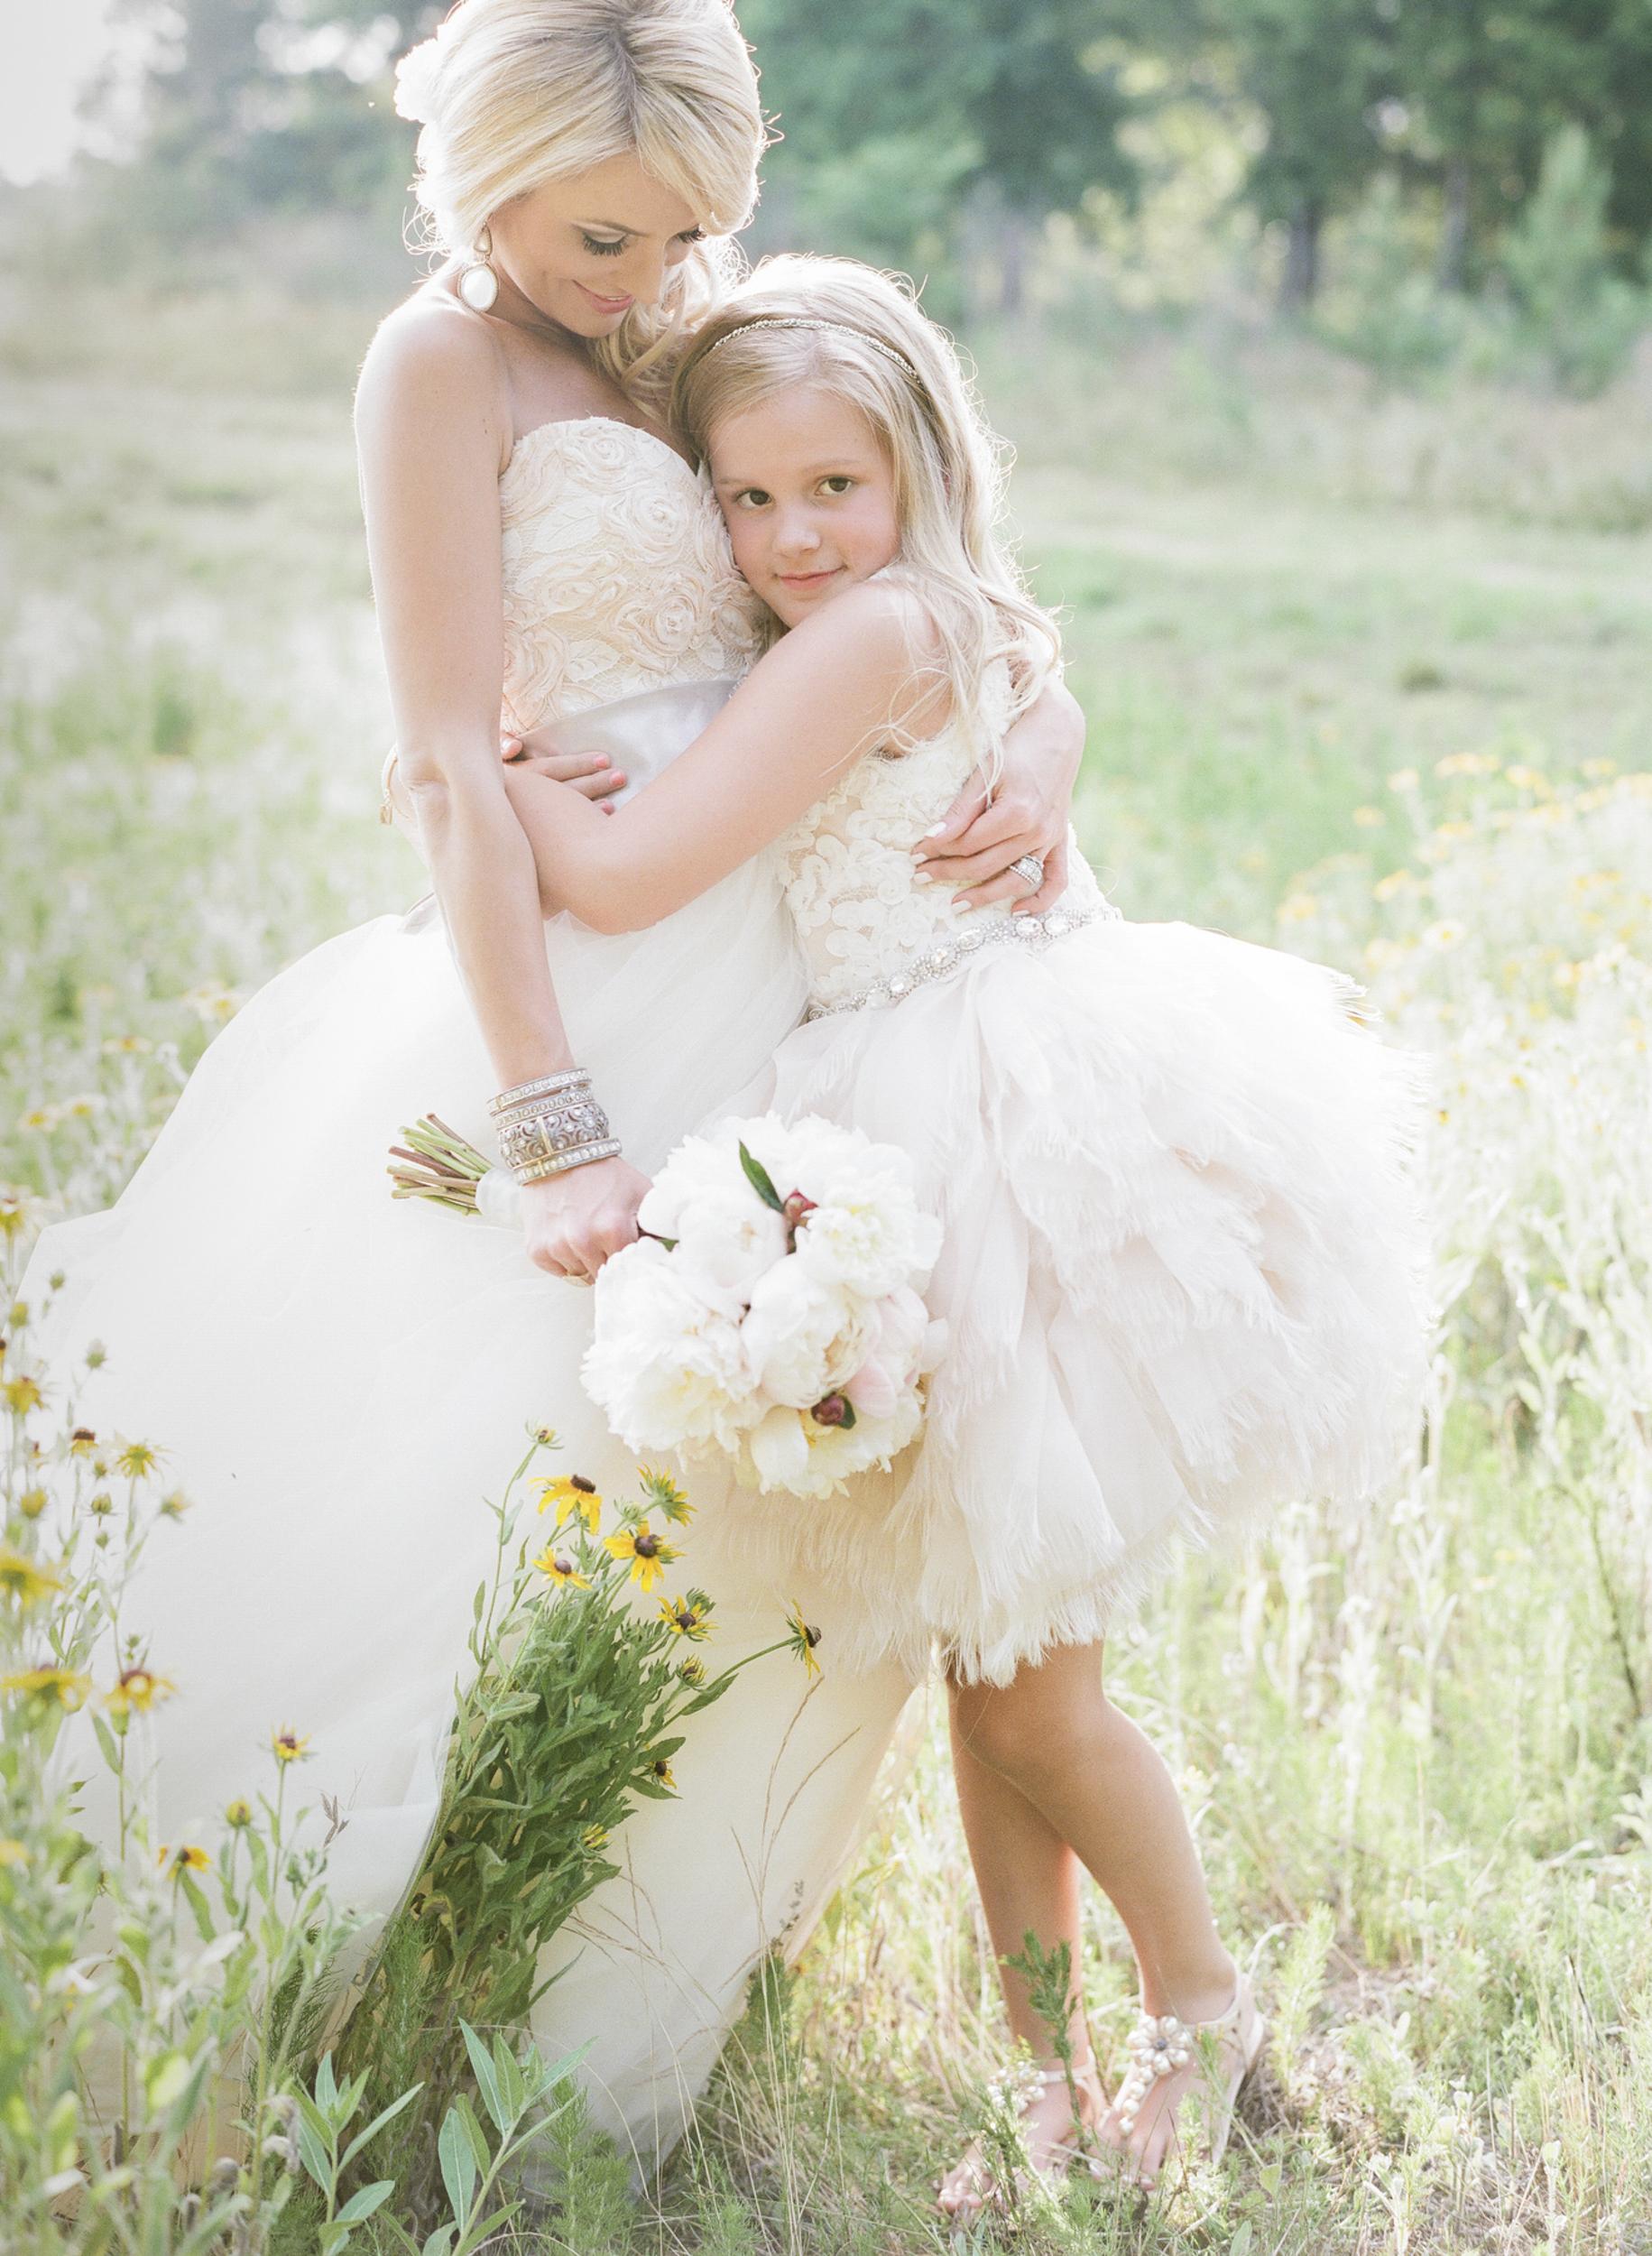 south_carolina_farm_wedding_rustic_chic_surprise_secret_luxe_wedding_bachelorette_emily_maynard_real_weddings-4.jpg